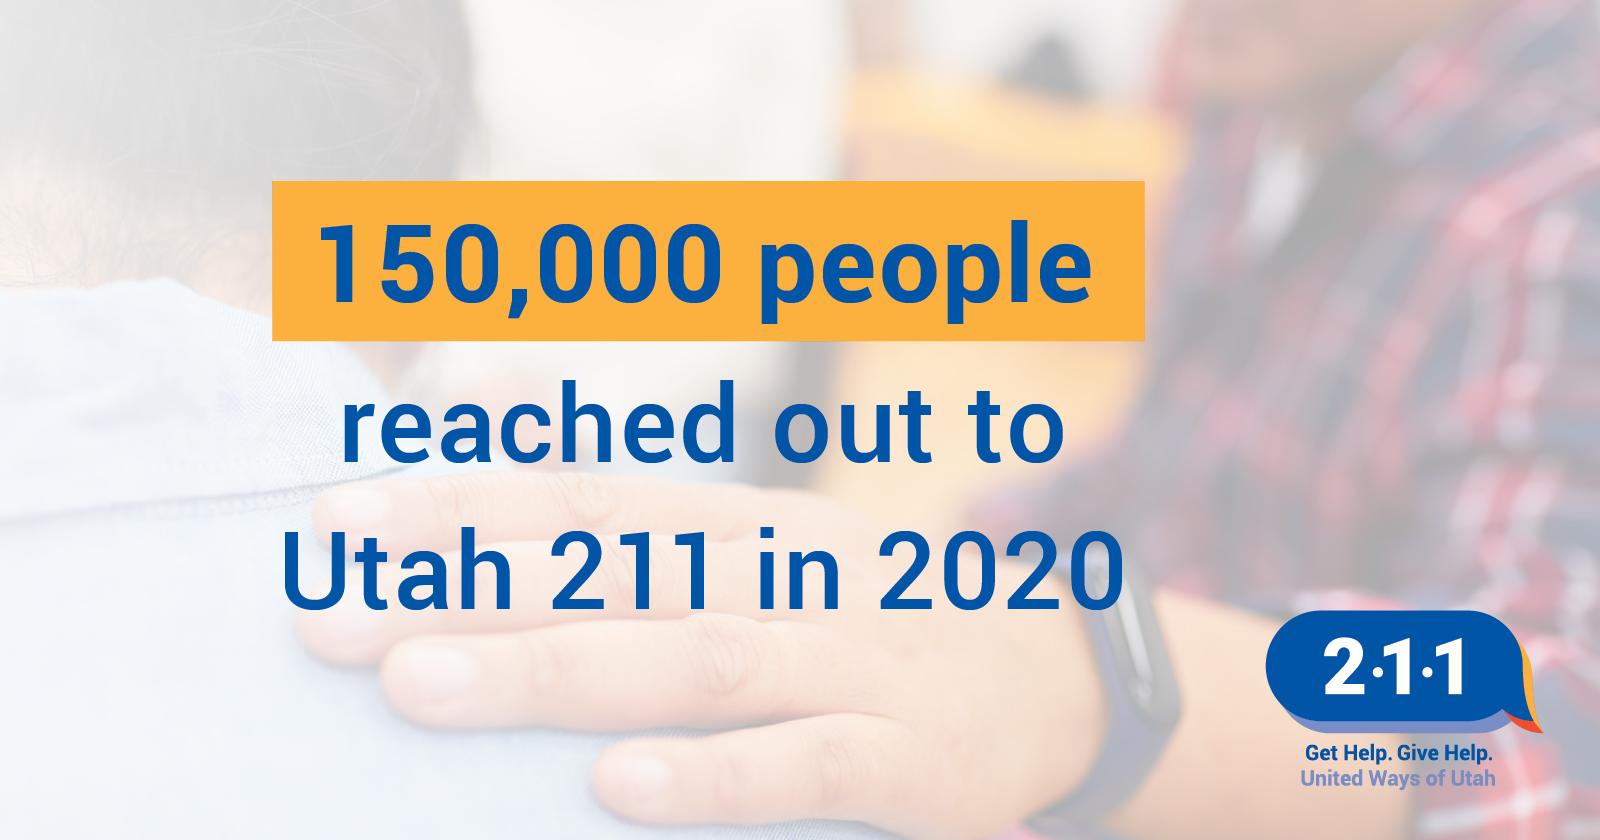 Number of people helped Utah 211 infographic